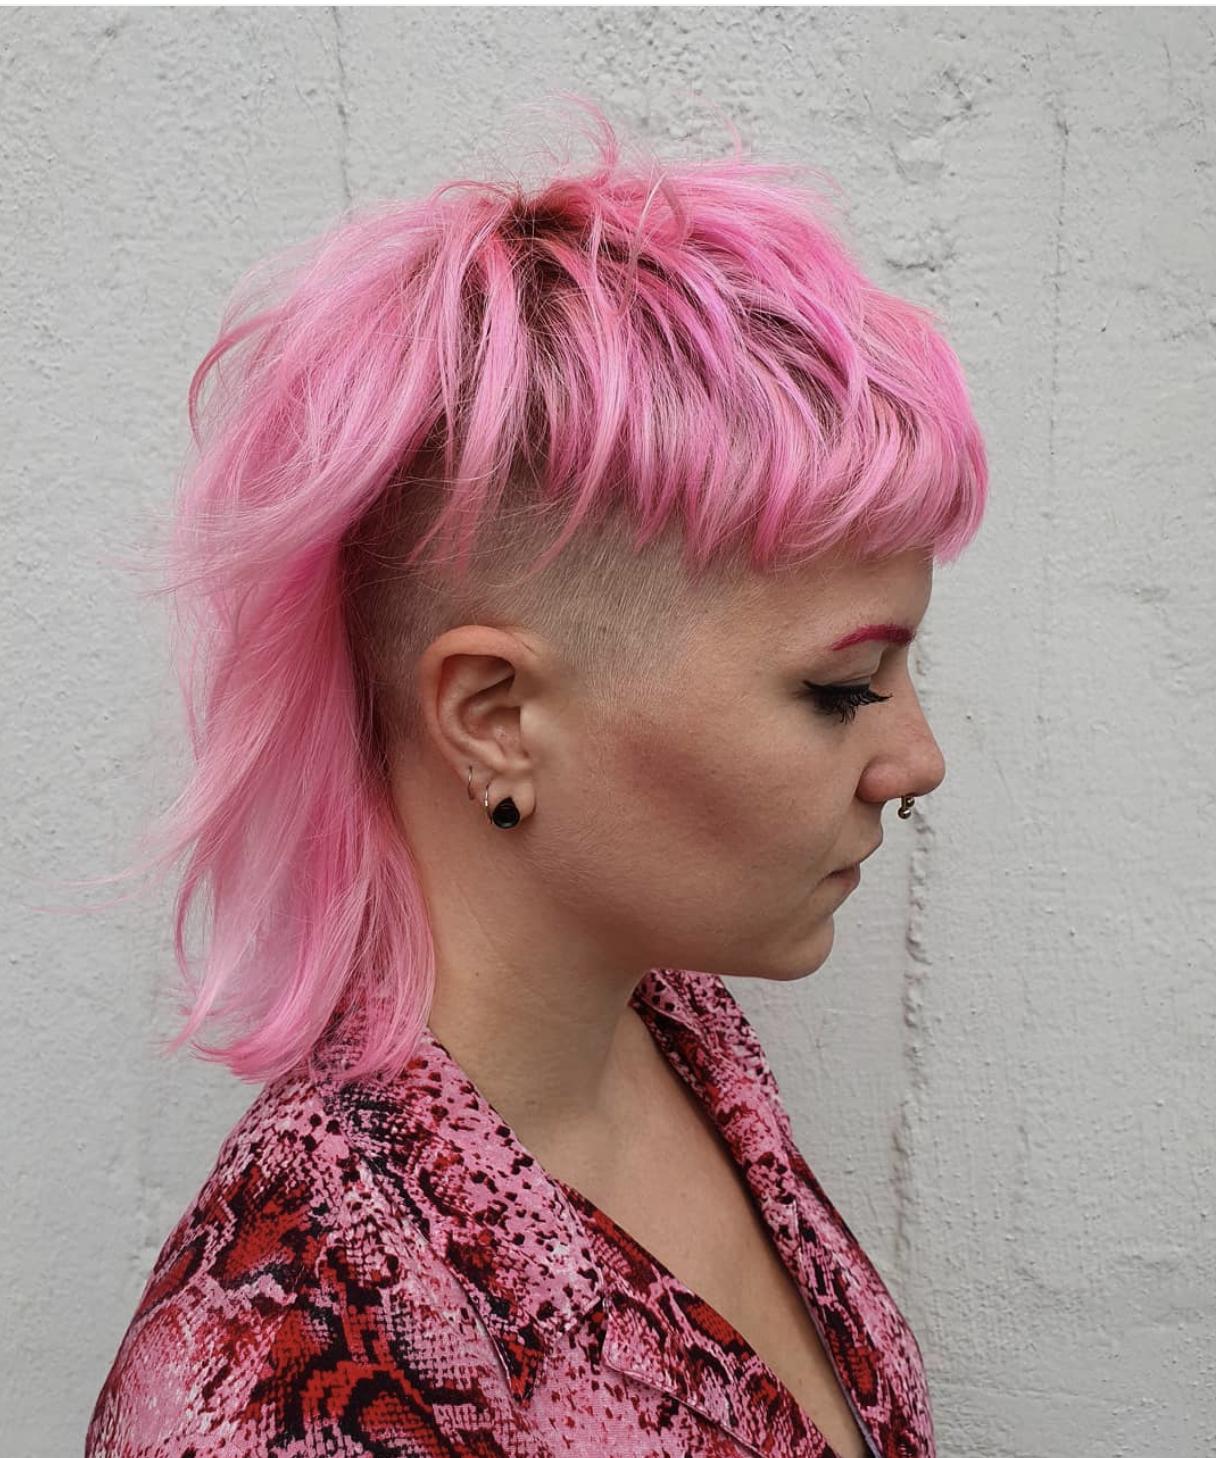 Pink Hair Mullet Is Back Mullet Hairstyle Punk Hair Hair Styles